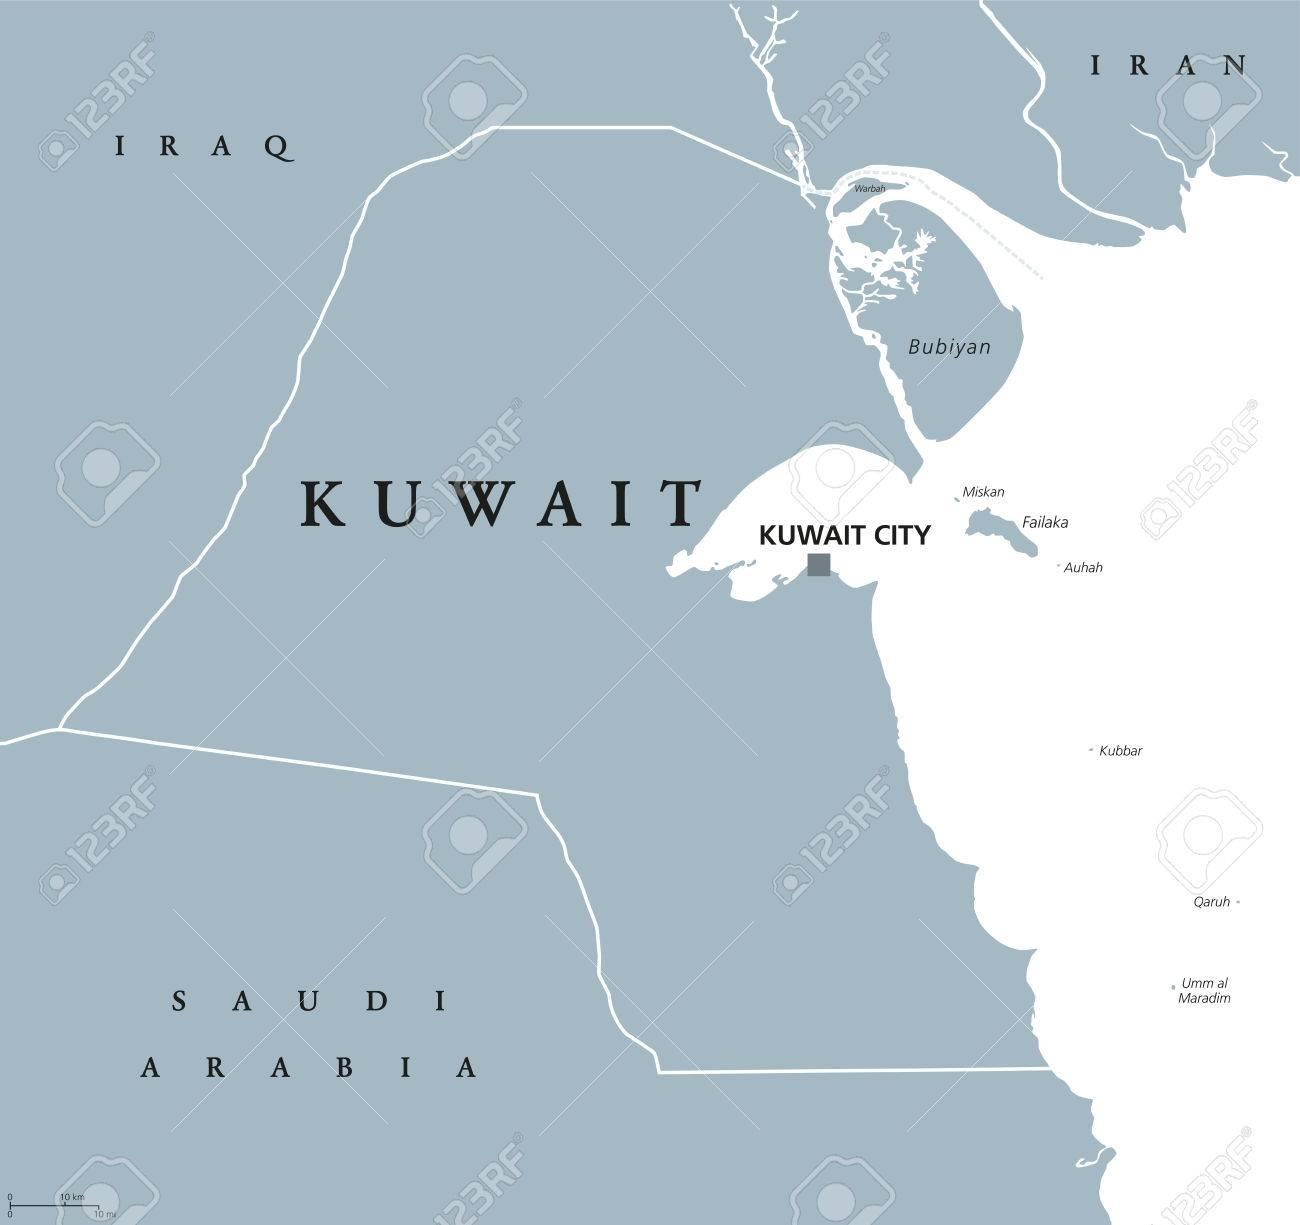 Kuwait political map with capital Kuwait City. State and Arab.. on middle east map, asia map, nigeria map, dubai map, libya map, israel map, eritrea map, benin map, botswana map, burundi map, japan map, oman map, bahrain map, syria map, djibouti map, saudi arabia map, africa map, qatar map, yemen map, taiwan map, latvia map, quatar map, abu dhabi map, iraq map, dead sea map, mali map, niger map, united states map, malawi map, senegal map, jordan map, mid east map, armenia map, kenya map, swaziland map, lesotho map, zambia map, georgia map, mauritania map,